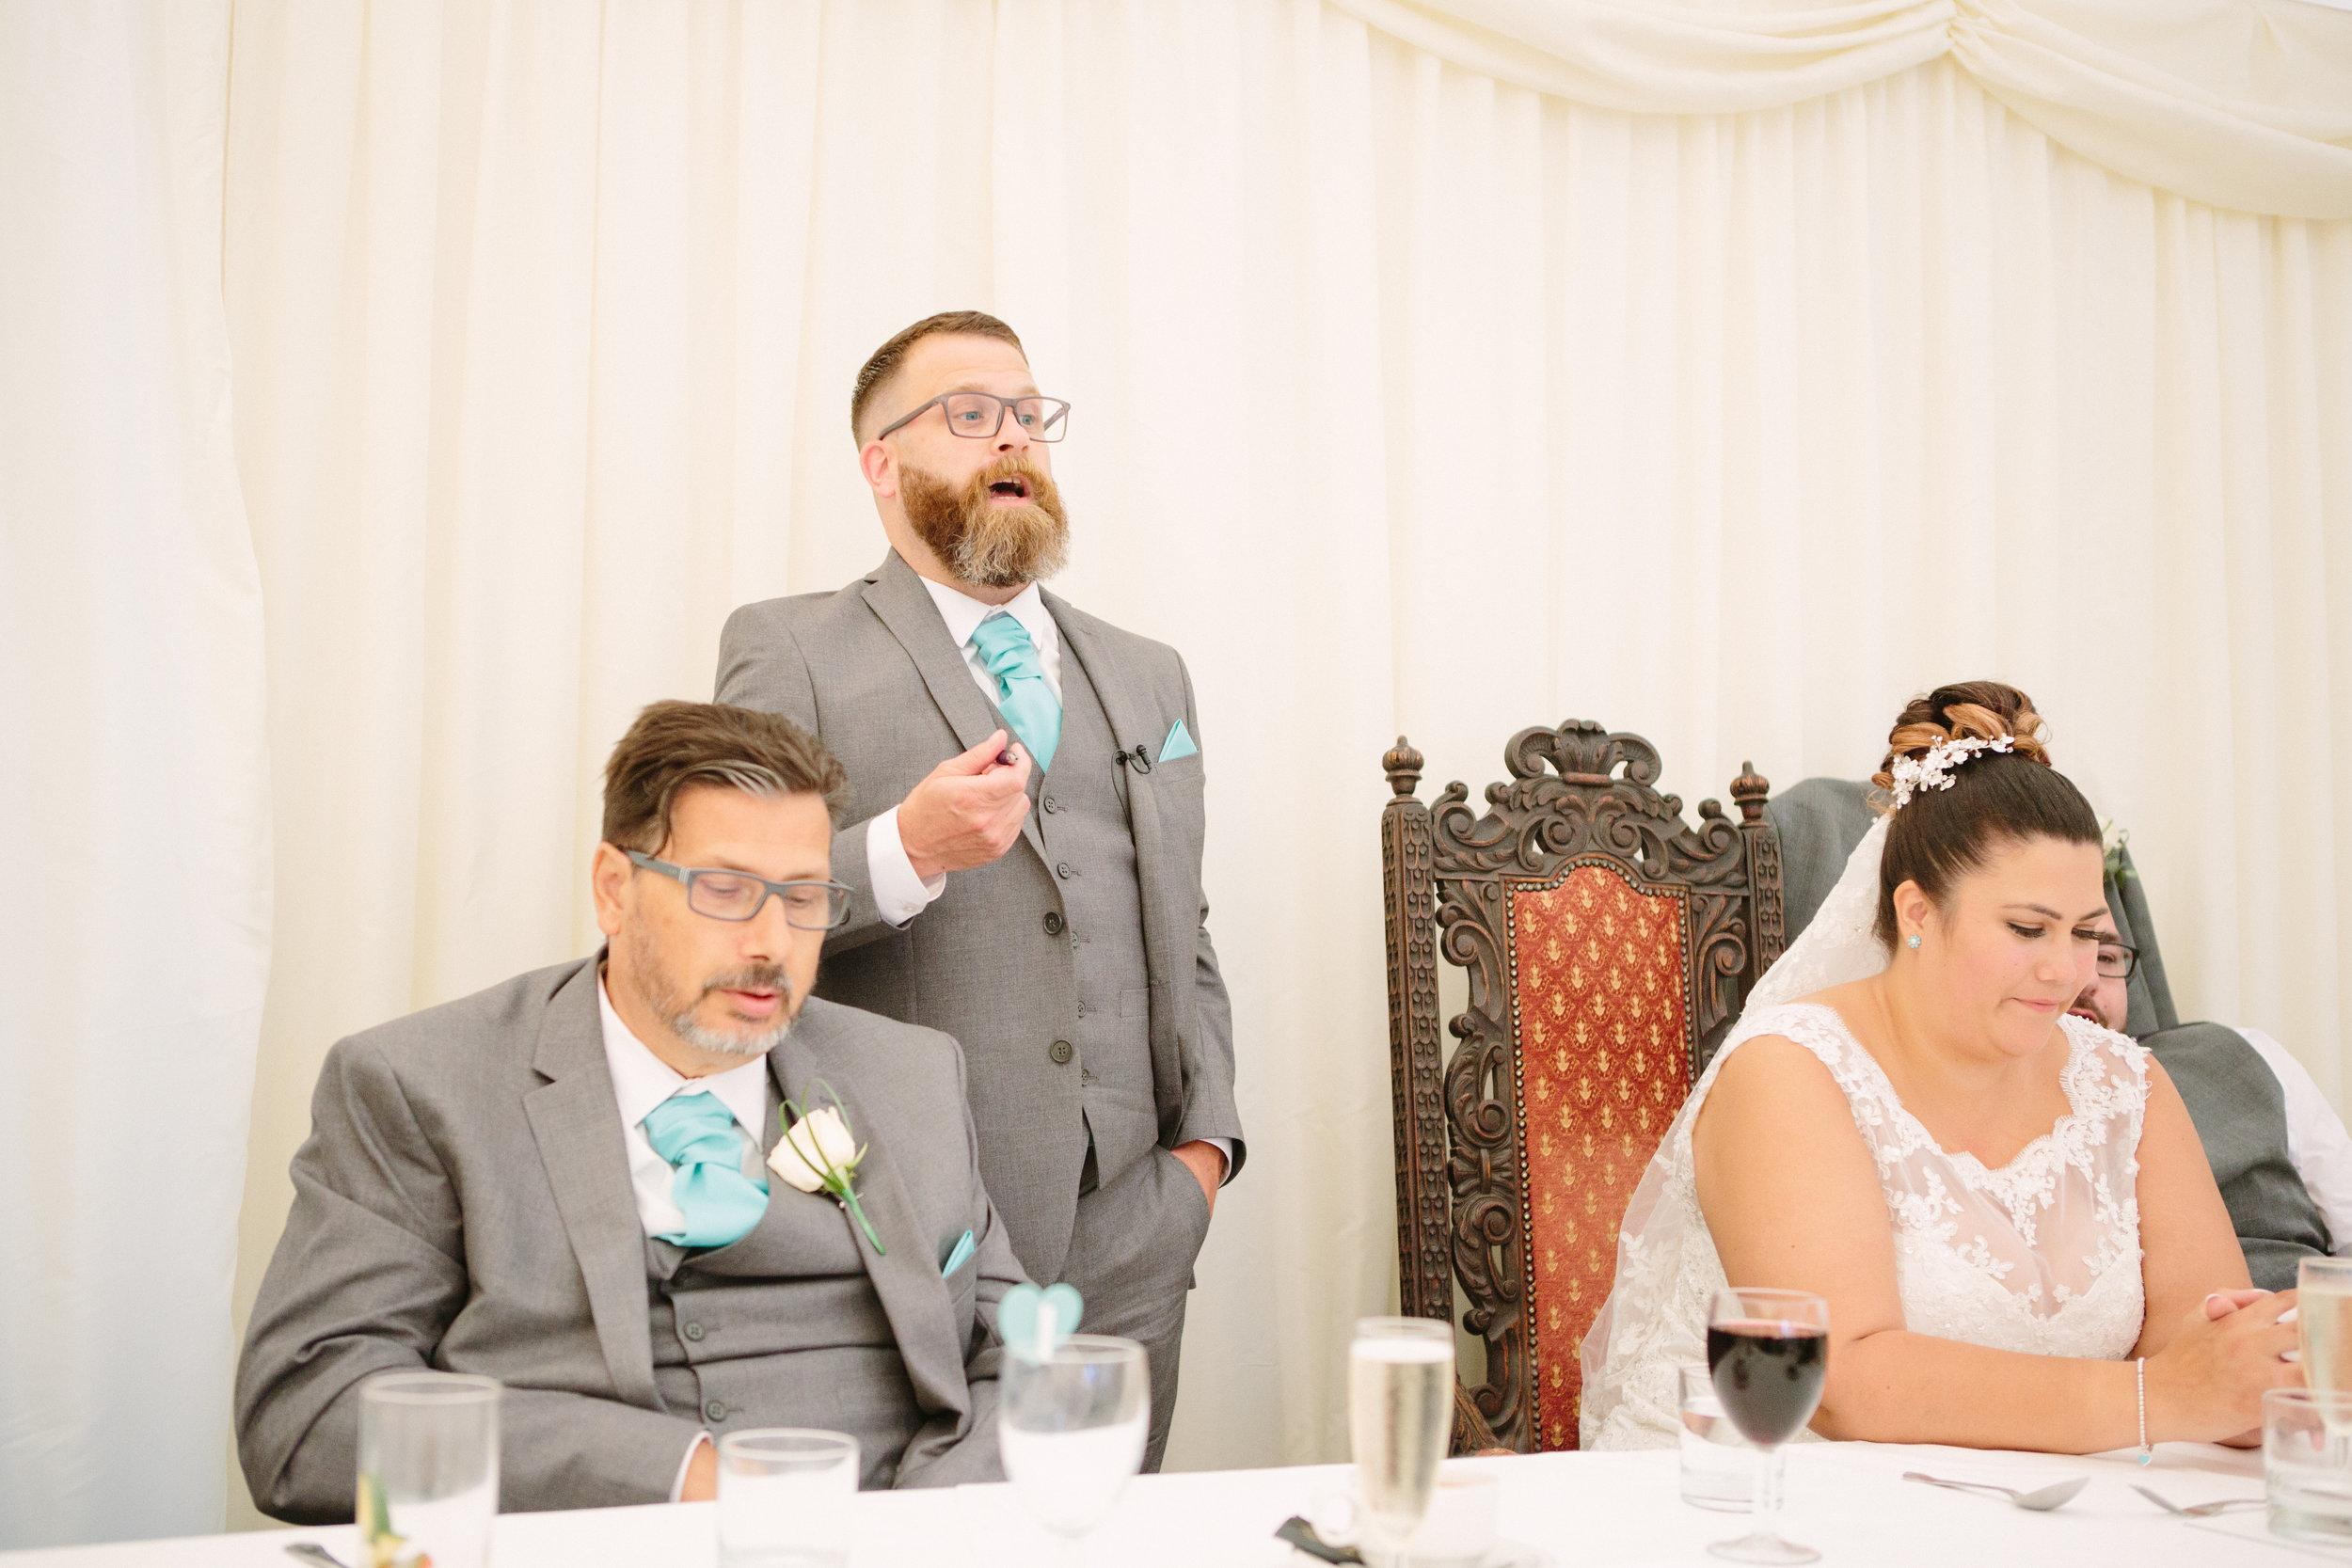 westenhangar-castle-kent-london-wedding-photography-speeches-59